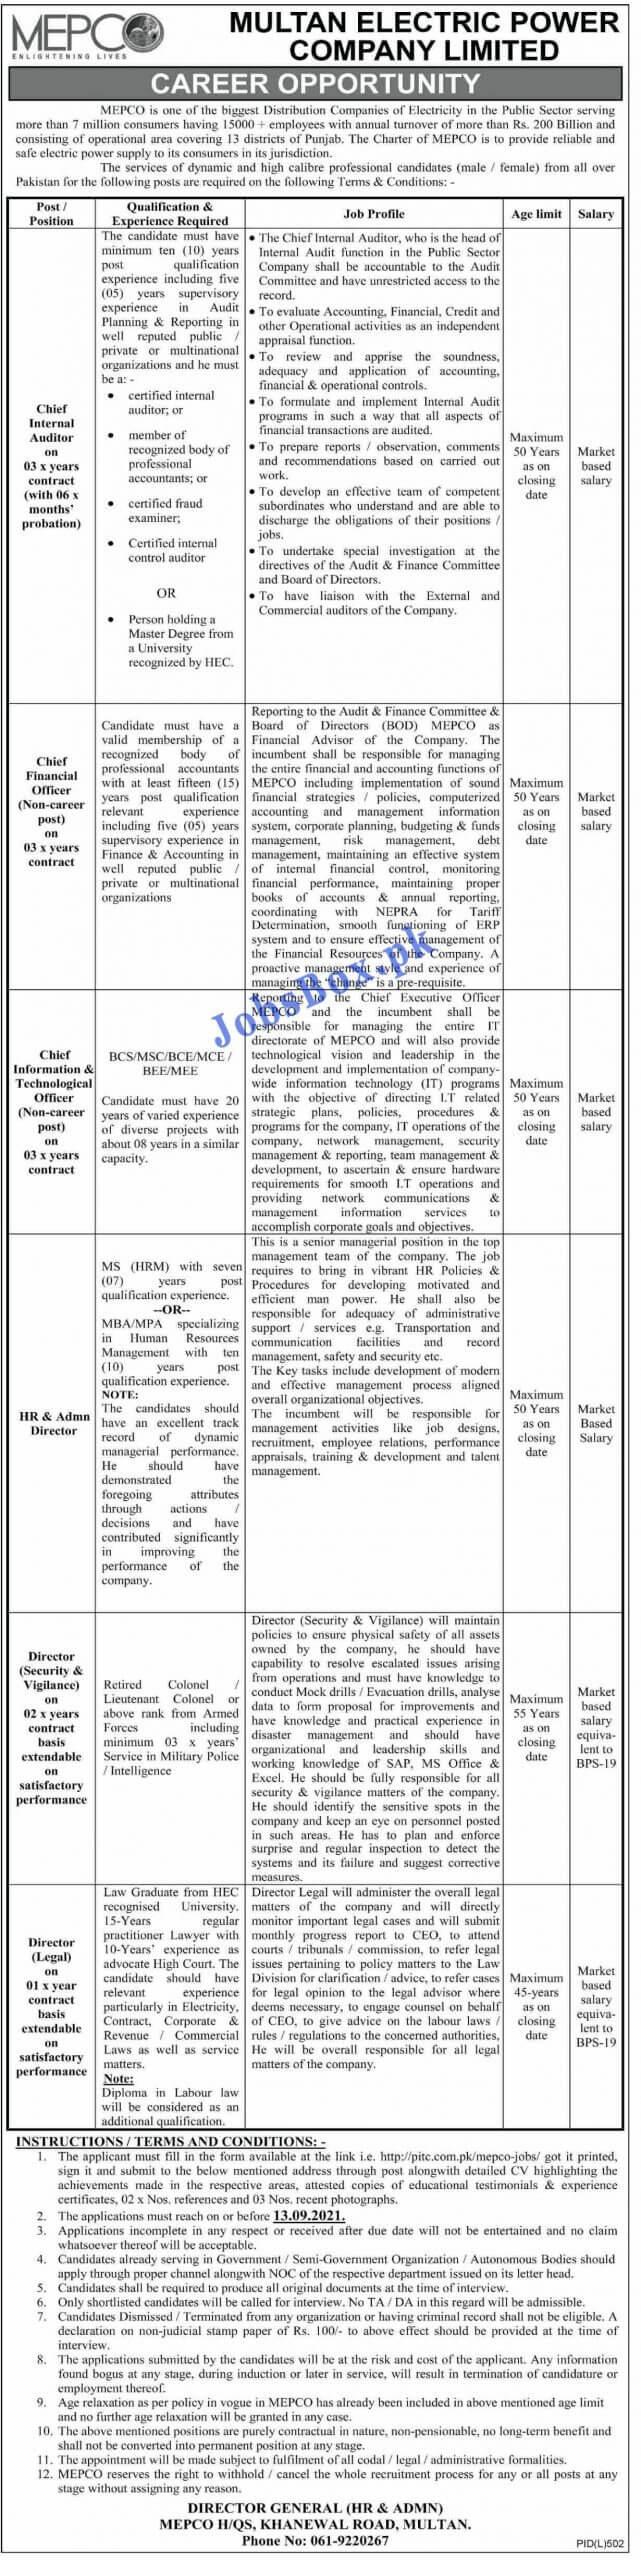 Latest WAPDA (MEPCO) Jobs 2021 | Multan Electric Power Supply Limited MEPCO Jobs 2021